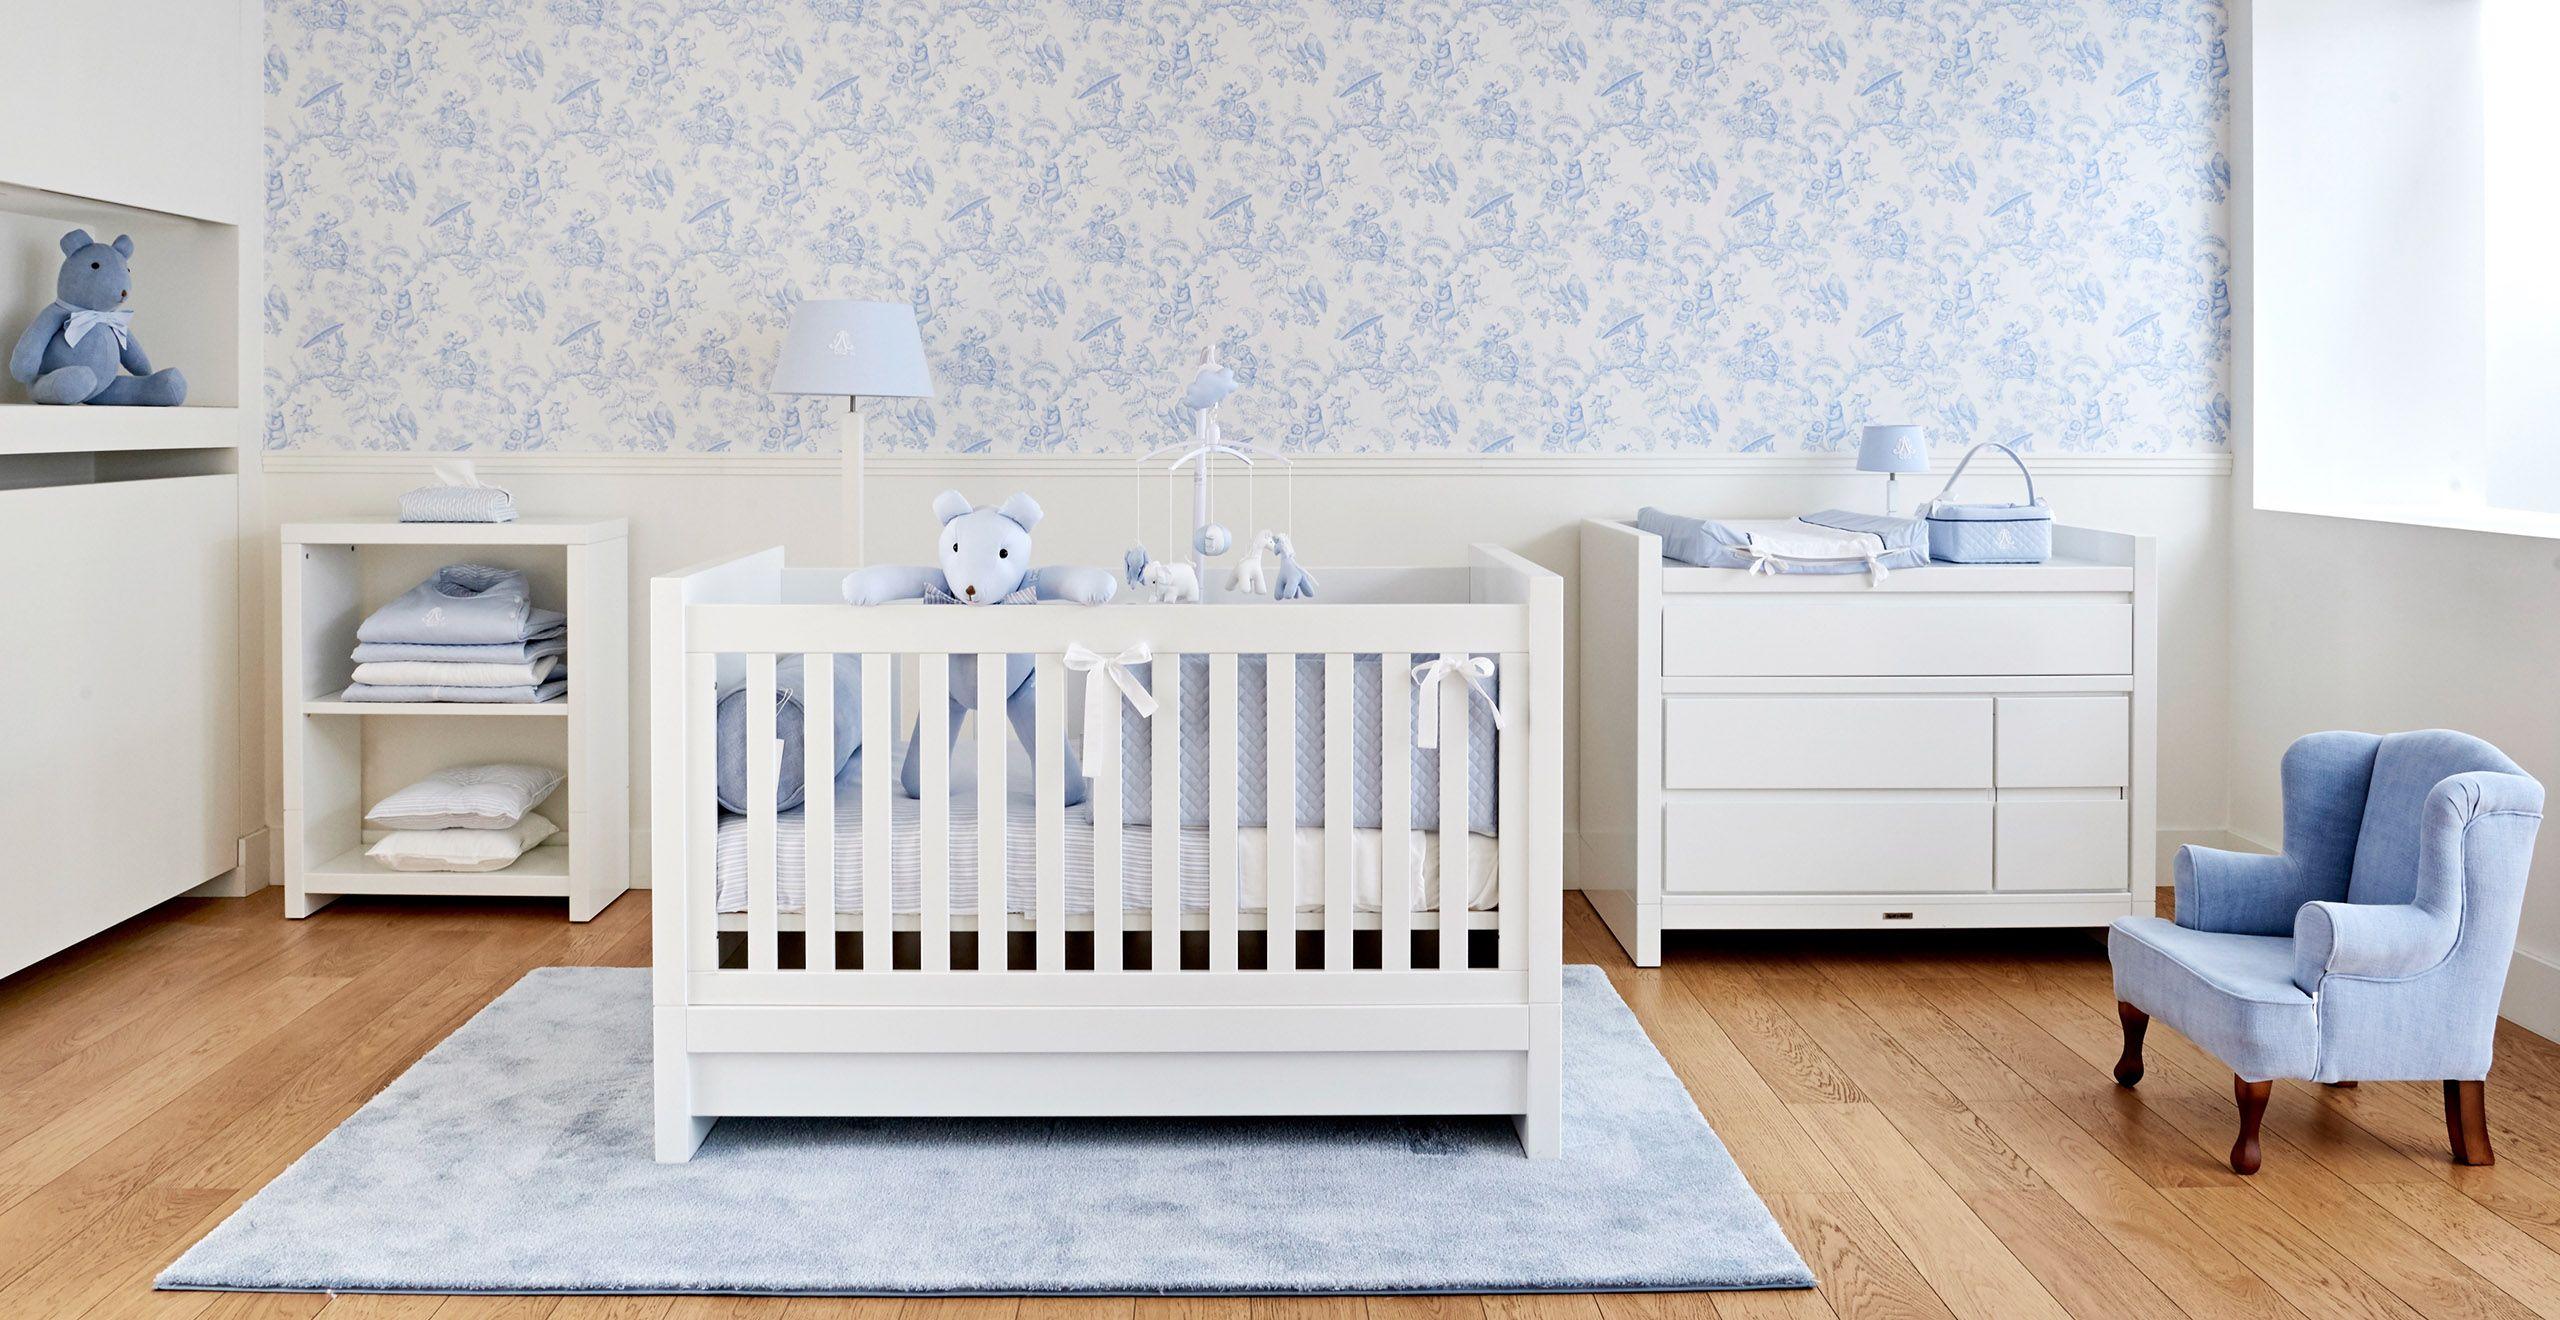 Baby cribs uae - Th Ophile Patachou Prestige Furniture And New Indigo